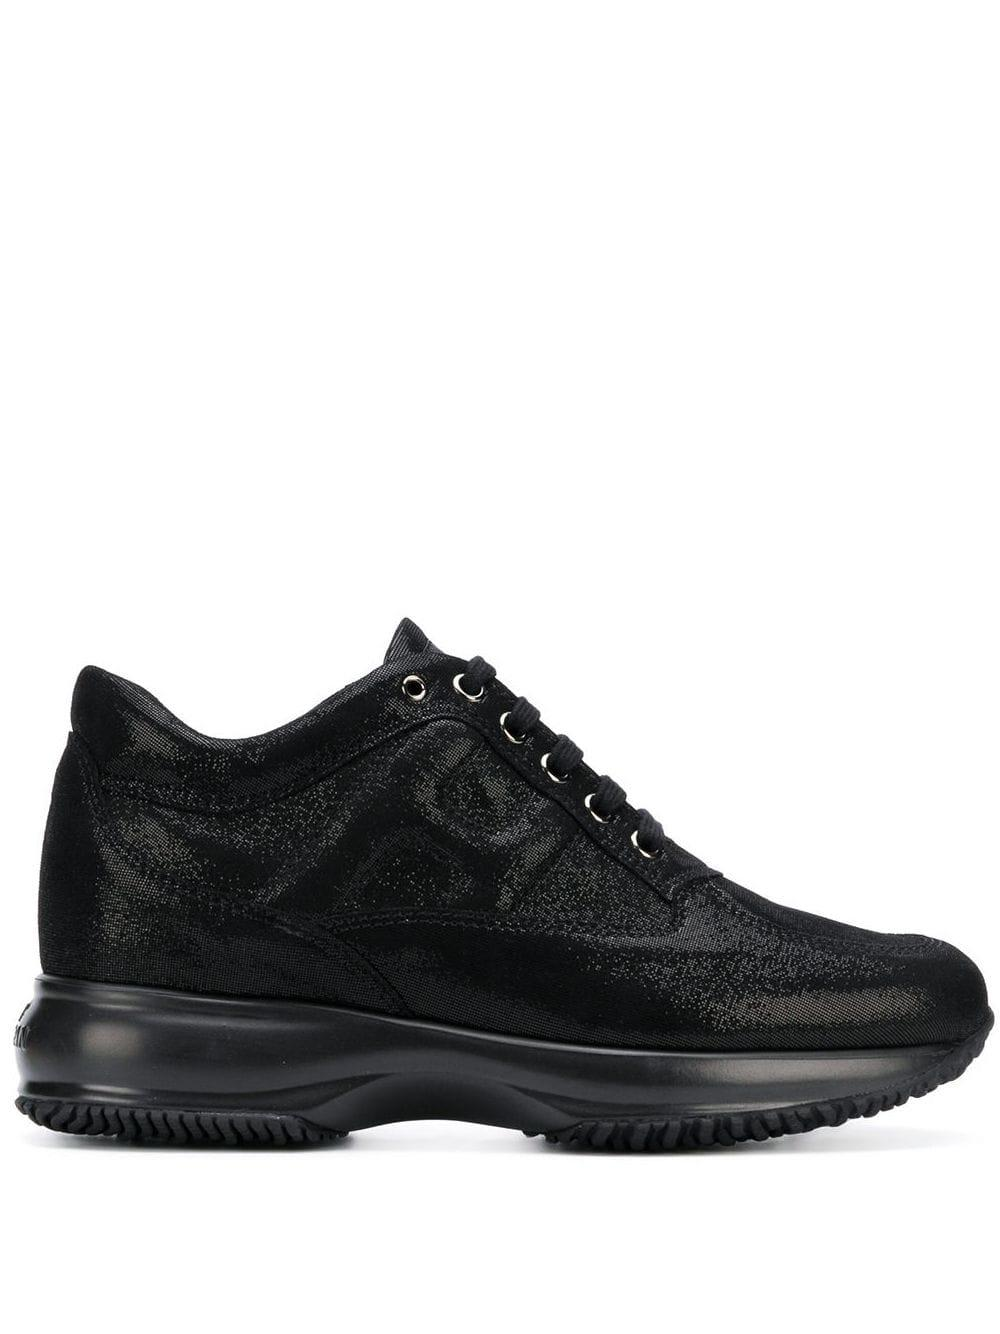 Hogan Suede Interactive 35 Sneakers in Black - Lyst